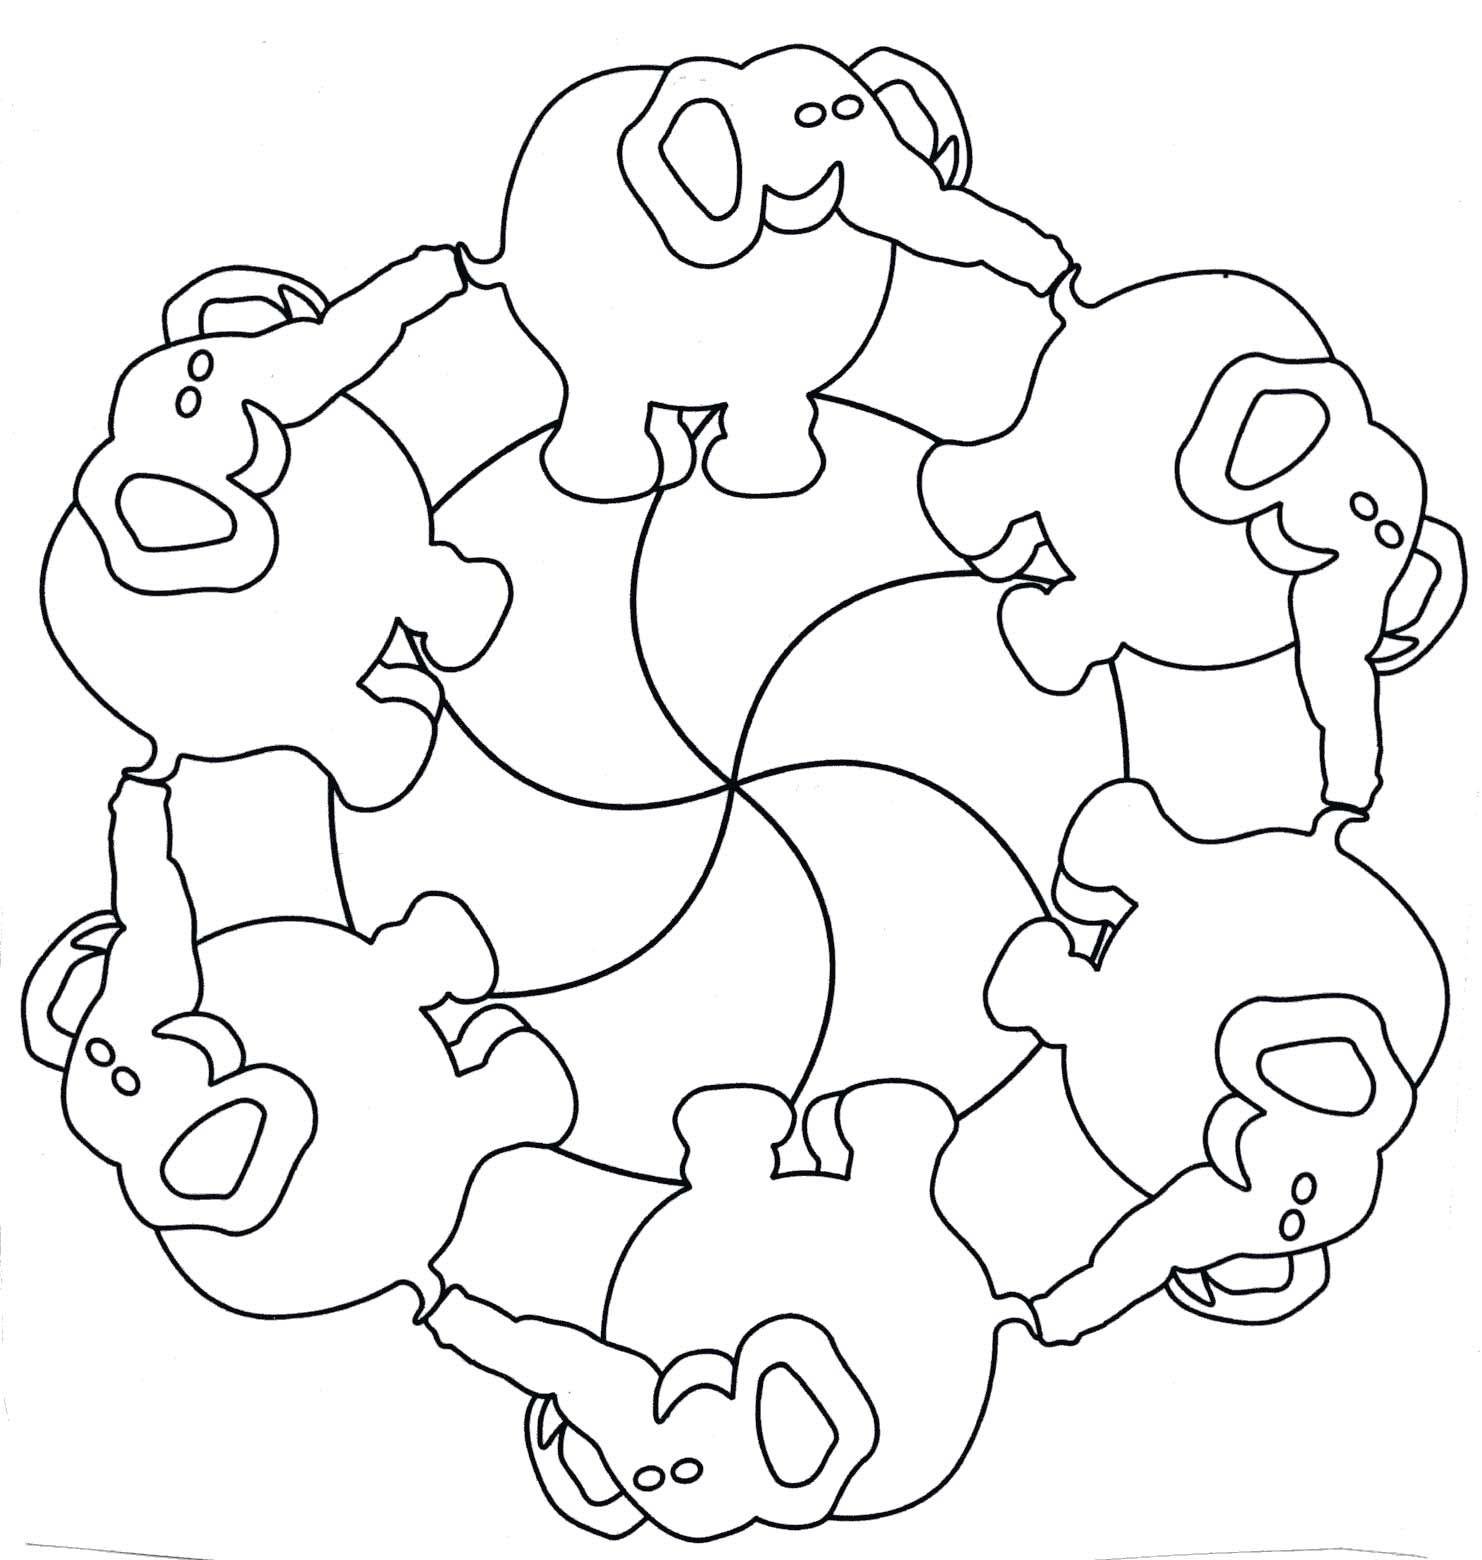 mandala kleuetrs olifant.jpg 1.482×1.560 píxeles | Olifant ...